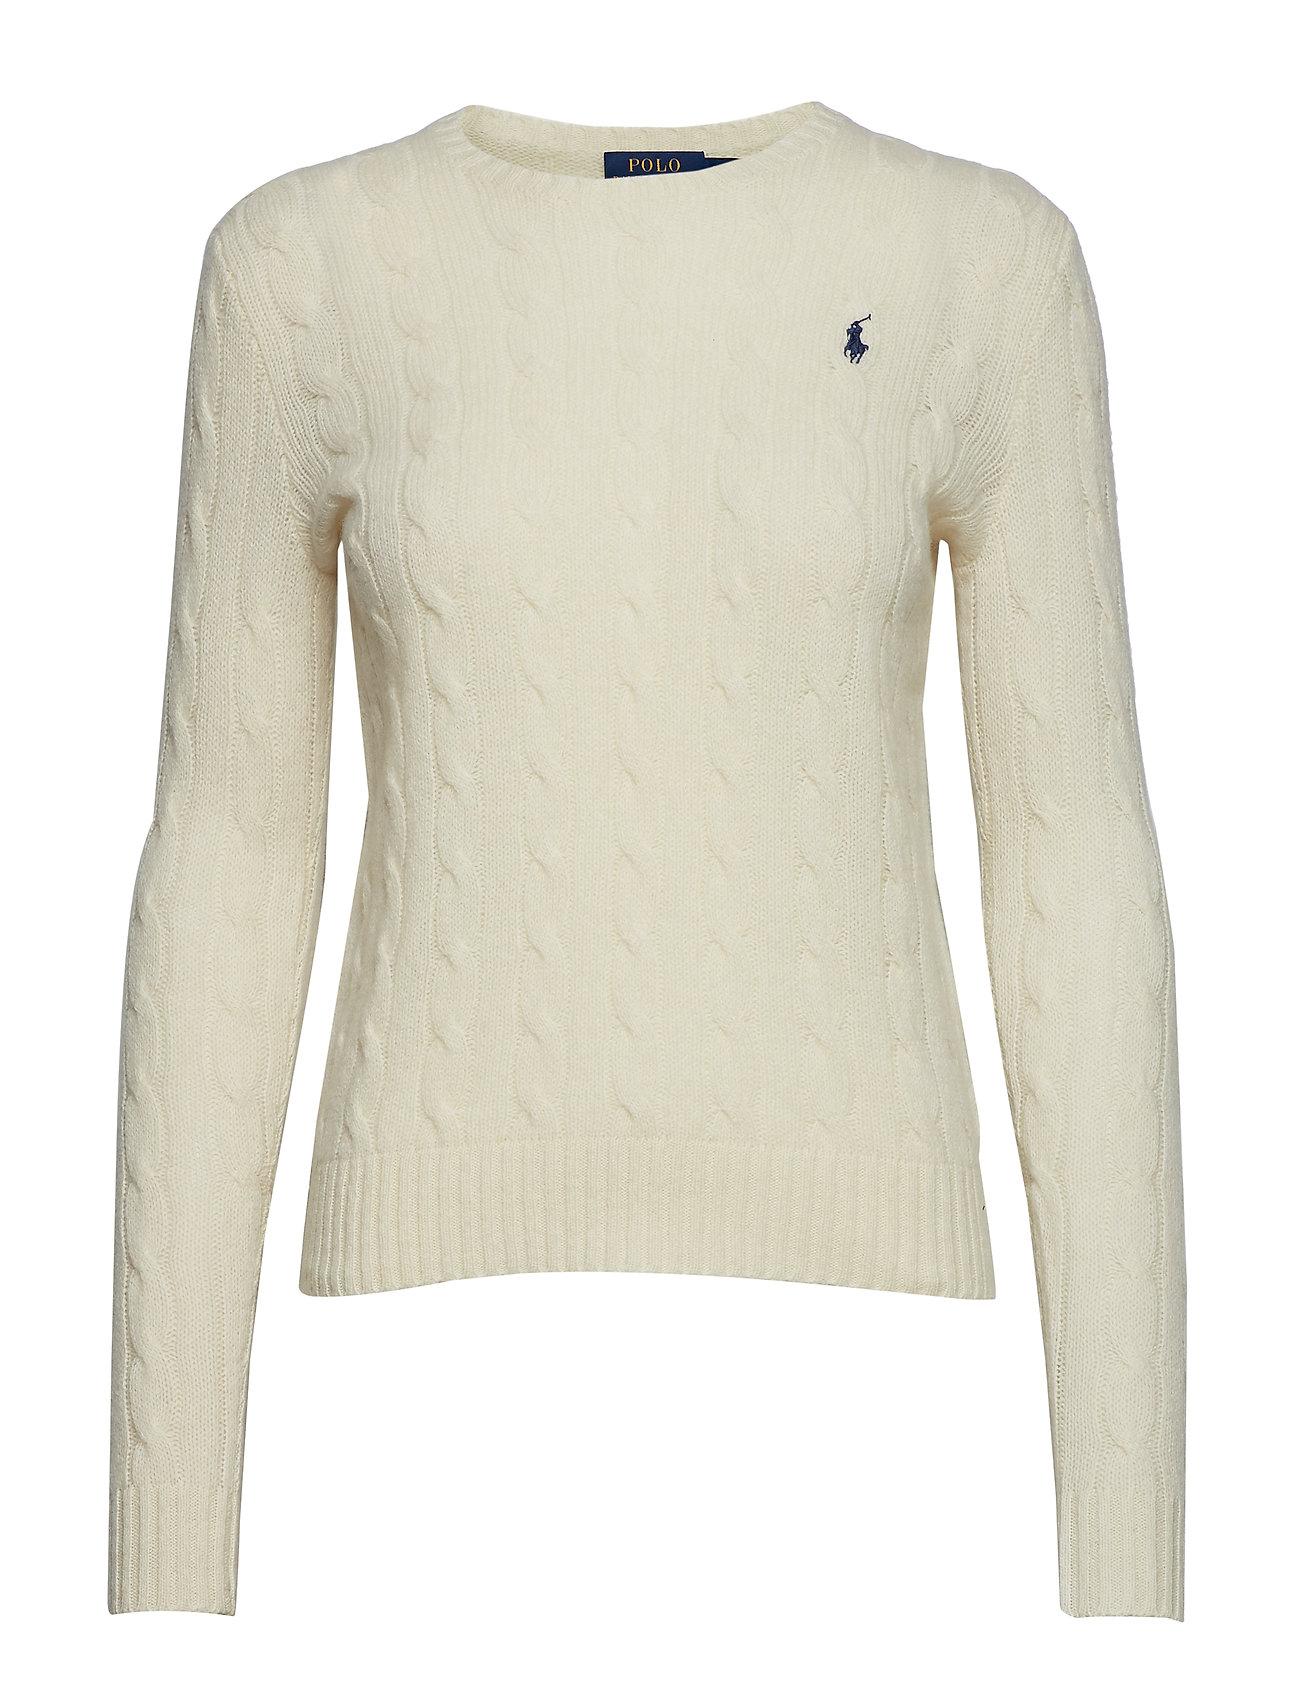 Polo Ralph Lauren Wool-Cashmere Crewneck Sweater - CREAM